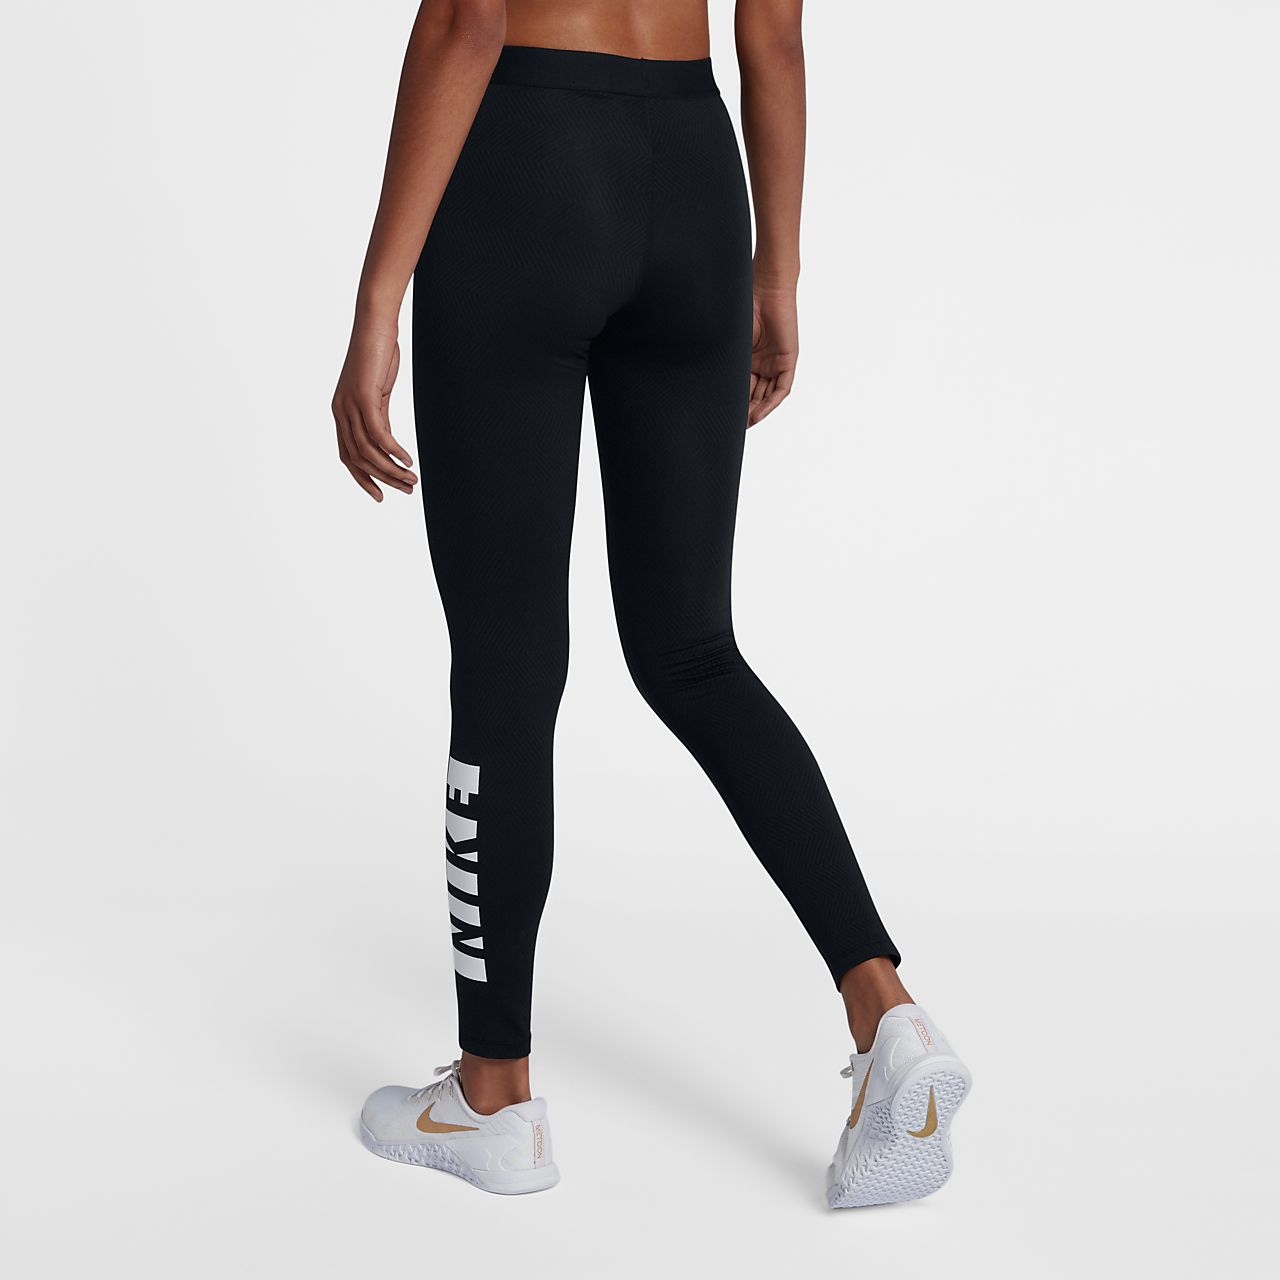 Women's Nike Pro Warm - Training Tights EI497451o